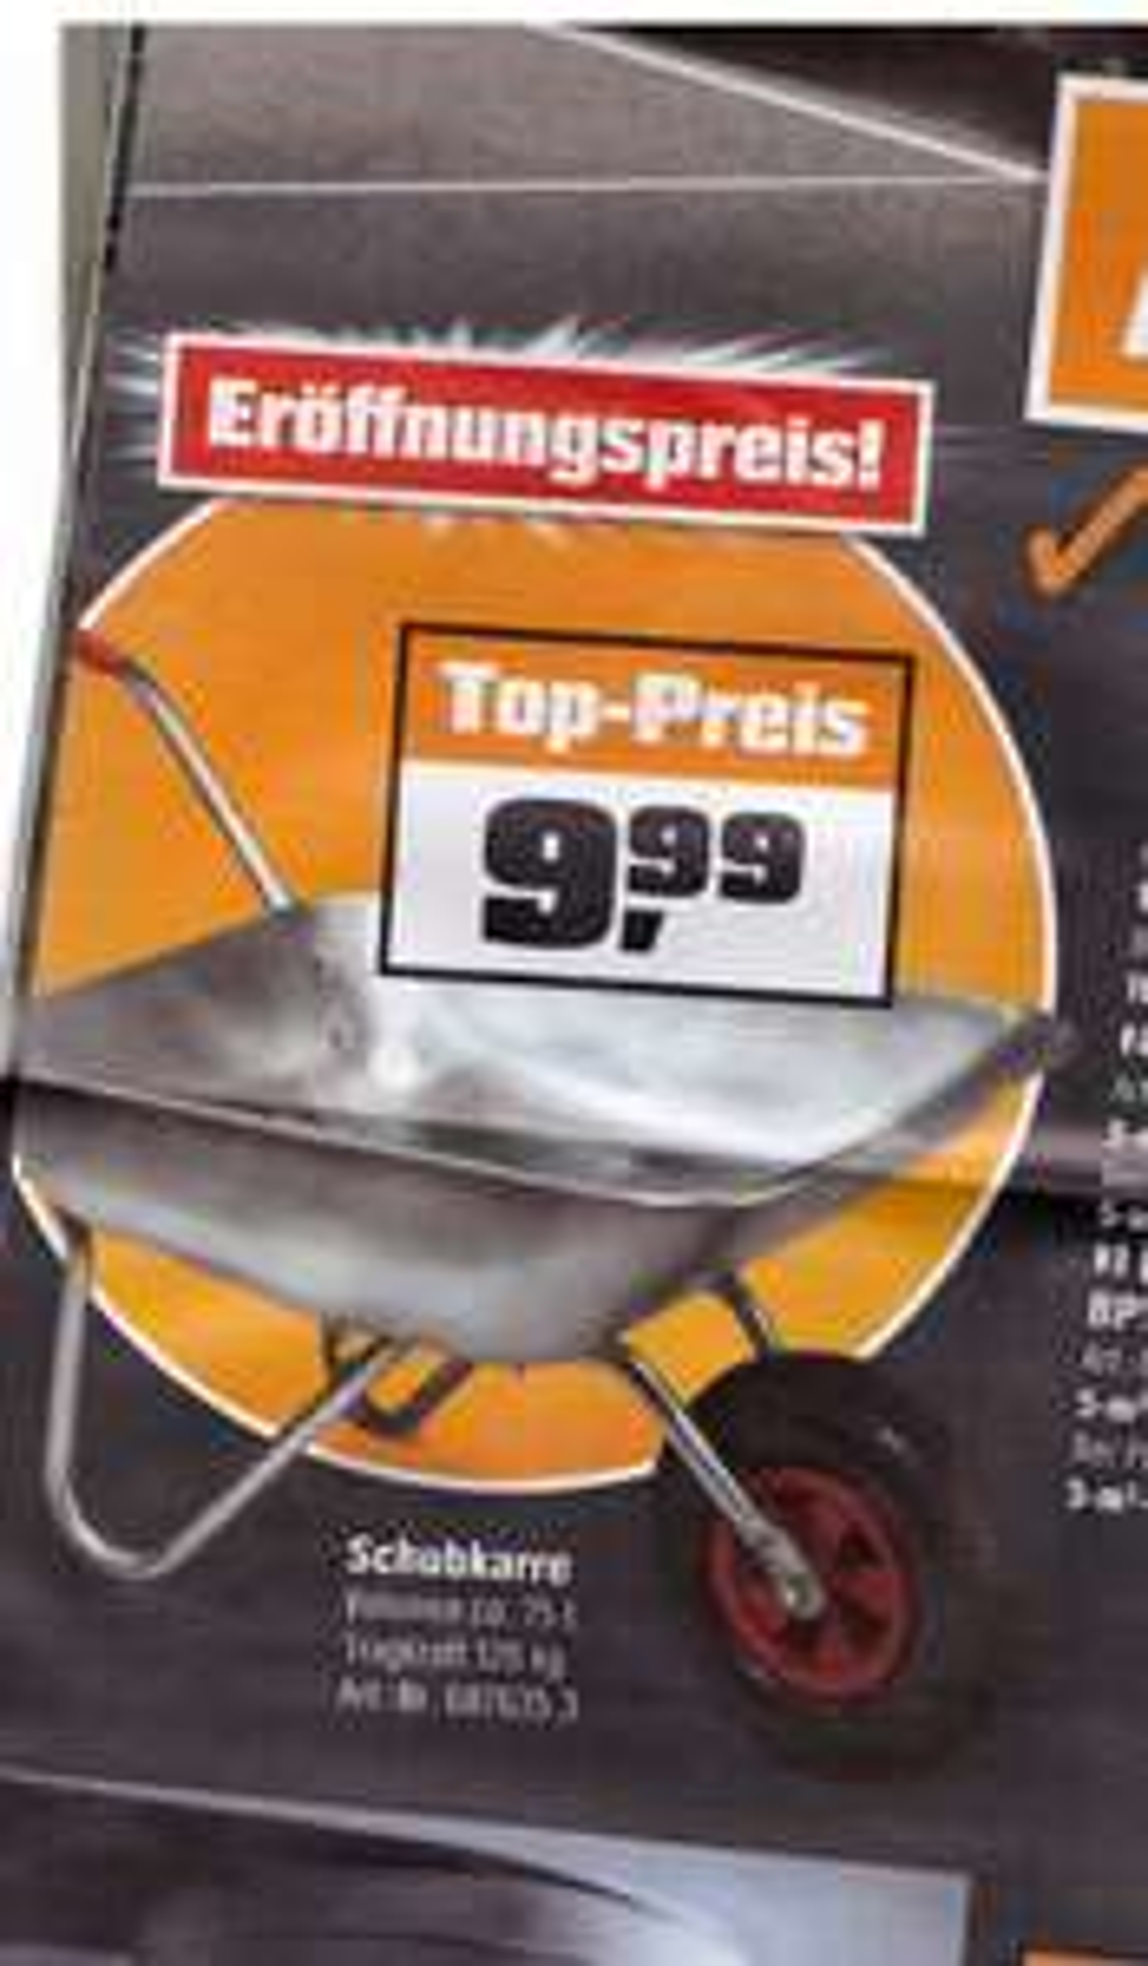 LOKAL OBI Eschweiler Schubkarre für 9,99€ statt 24,99€